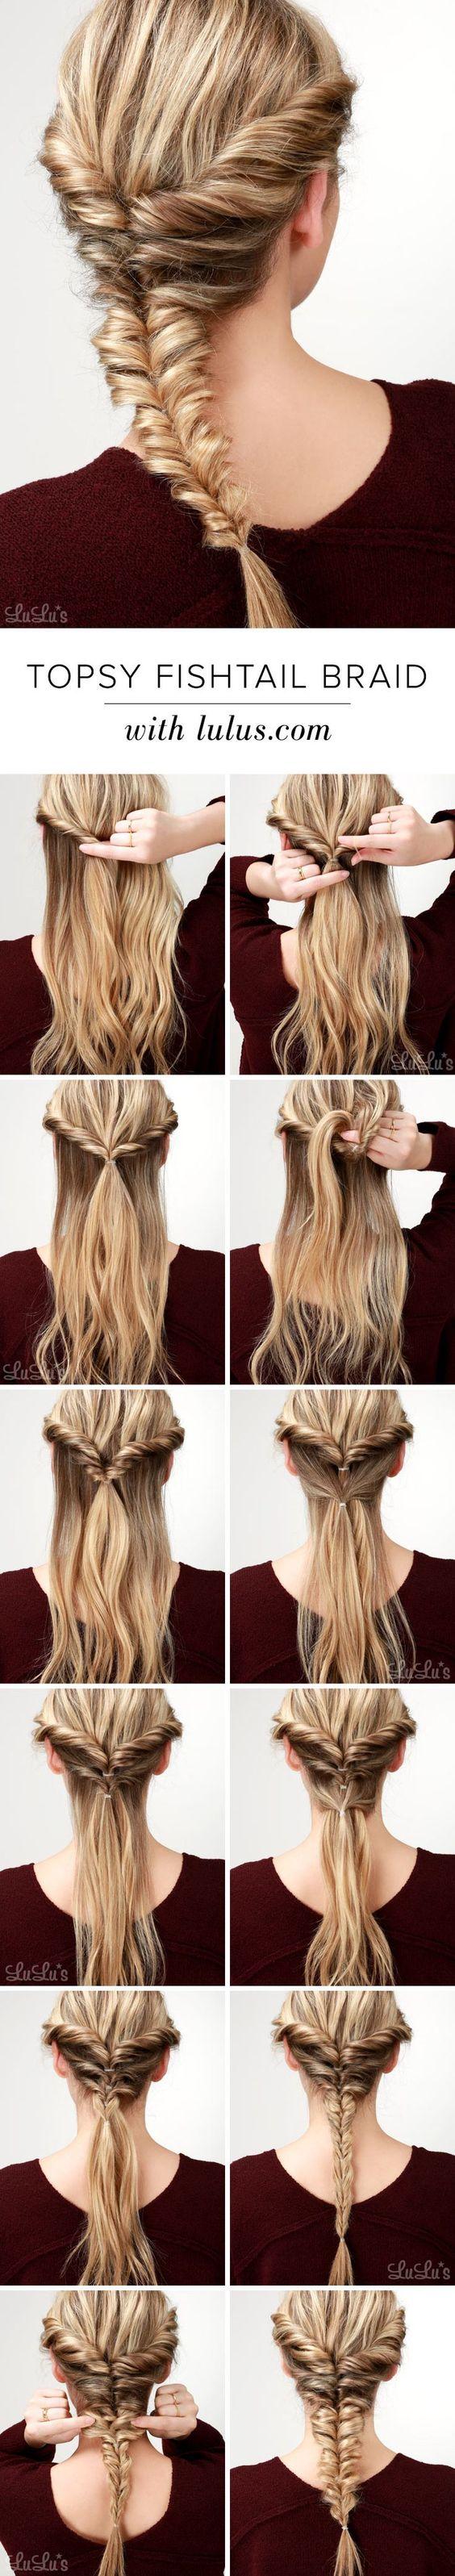 12 vlecht tutorials die je moet kennen voor het seizoen Kapsels  Vlechtkapsellessen Video gaming Video games Tail hairstyles French braid fashion braid bangs